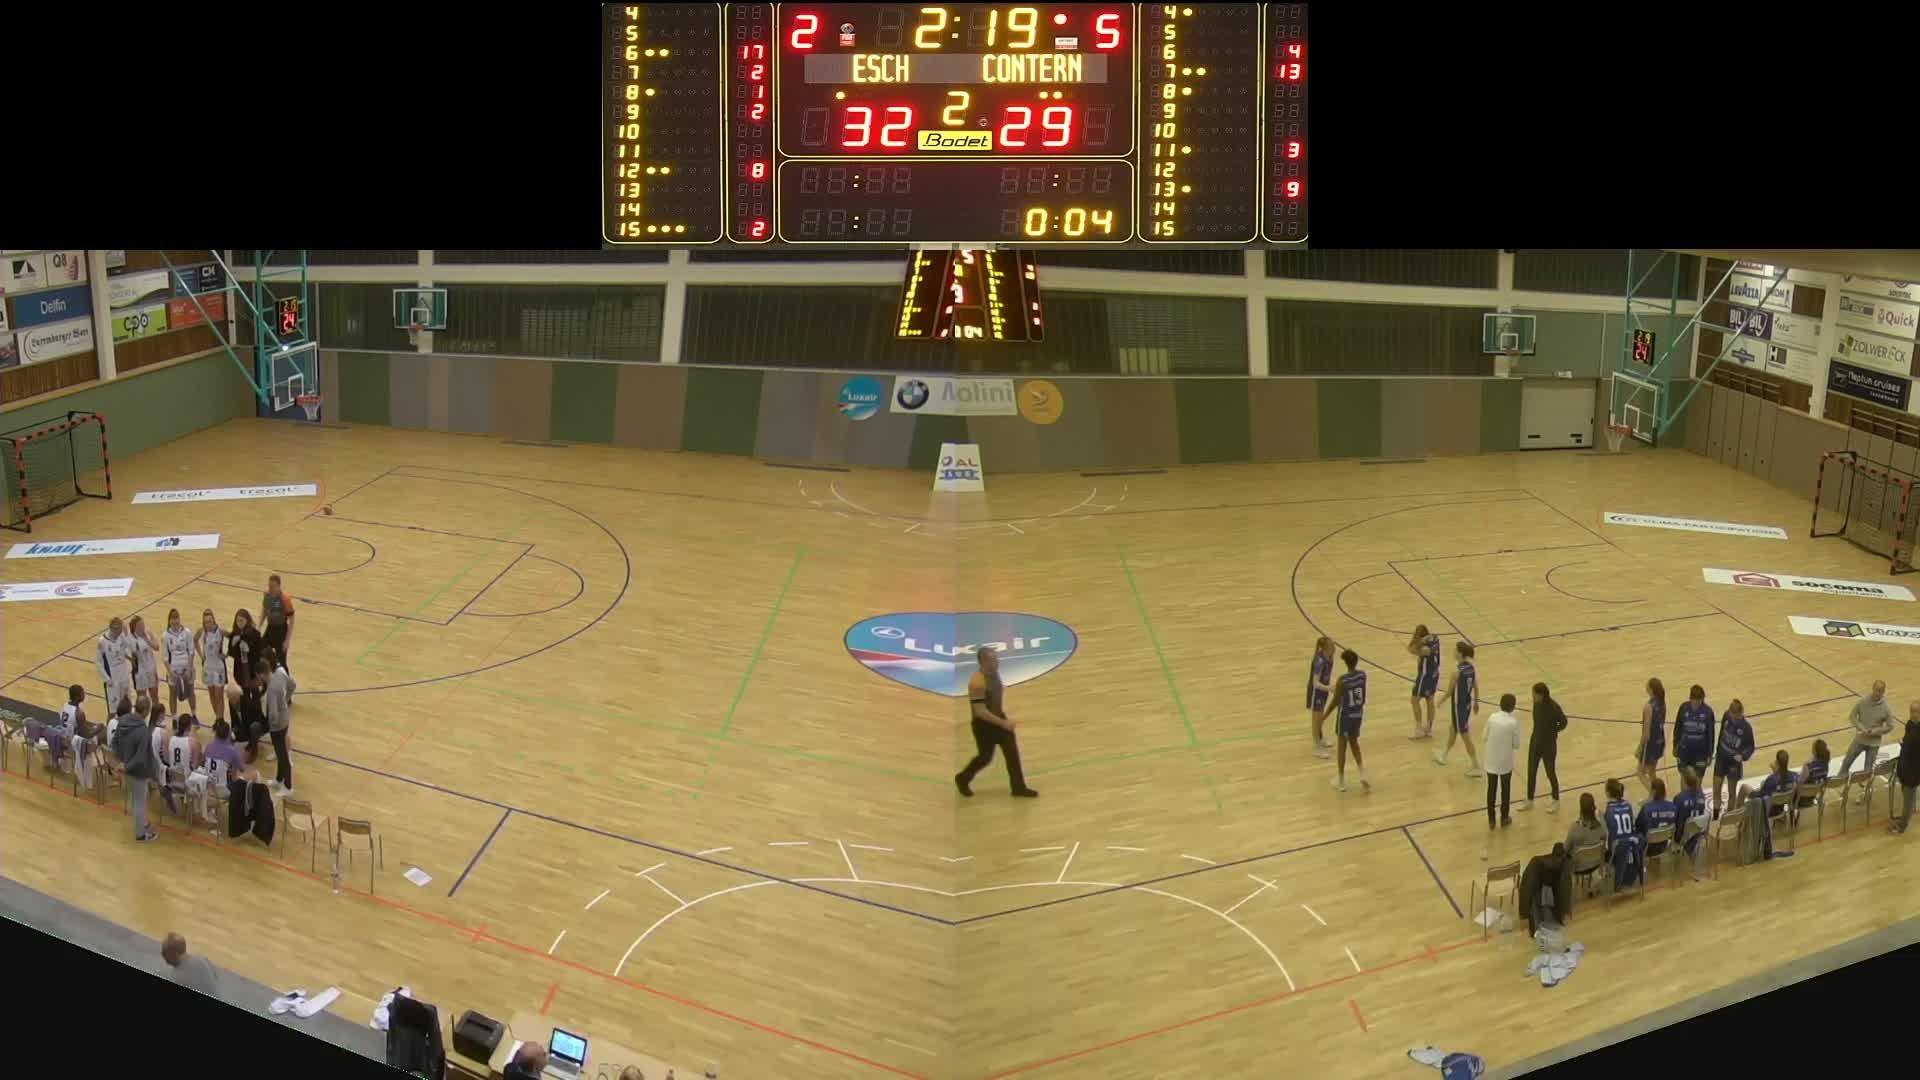 Basket Esch ( Dames A ) - Contern - 30.11.2019